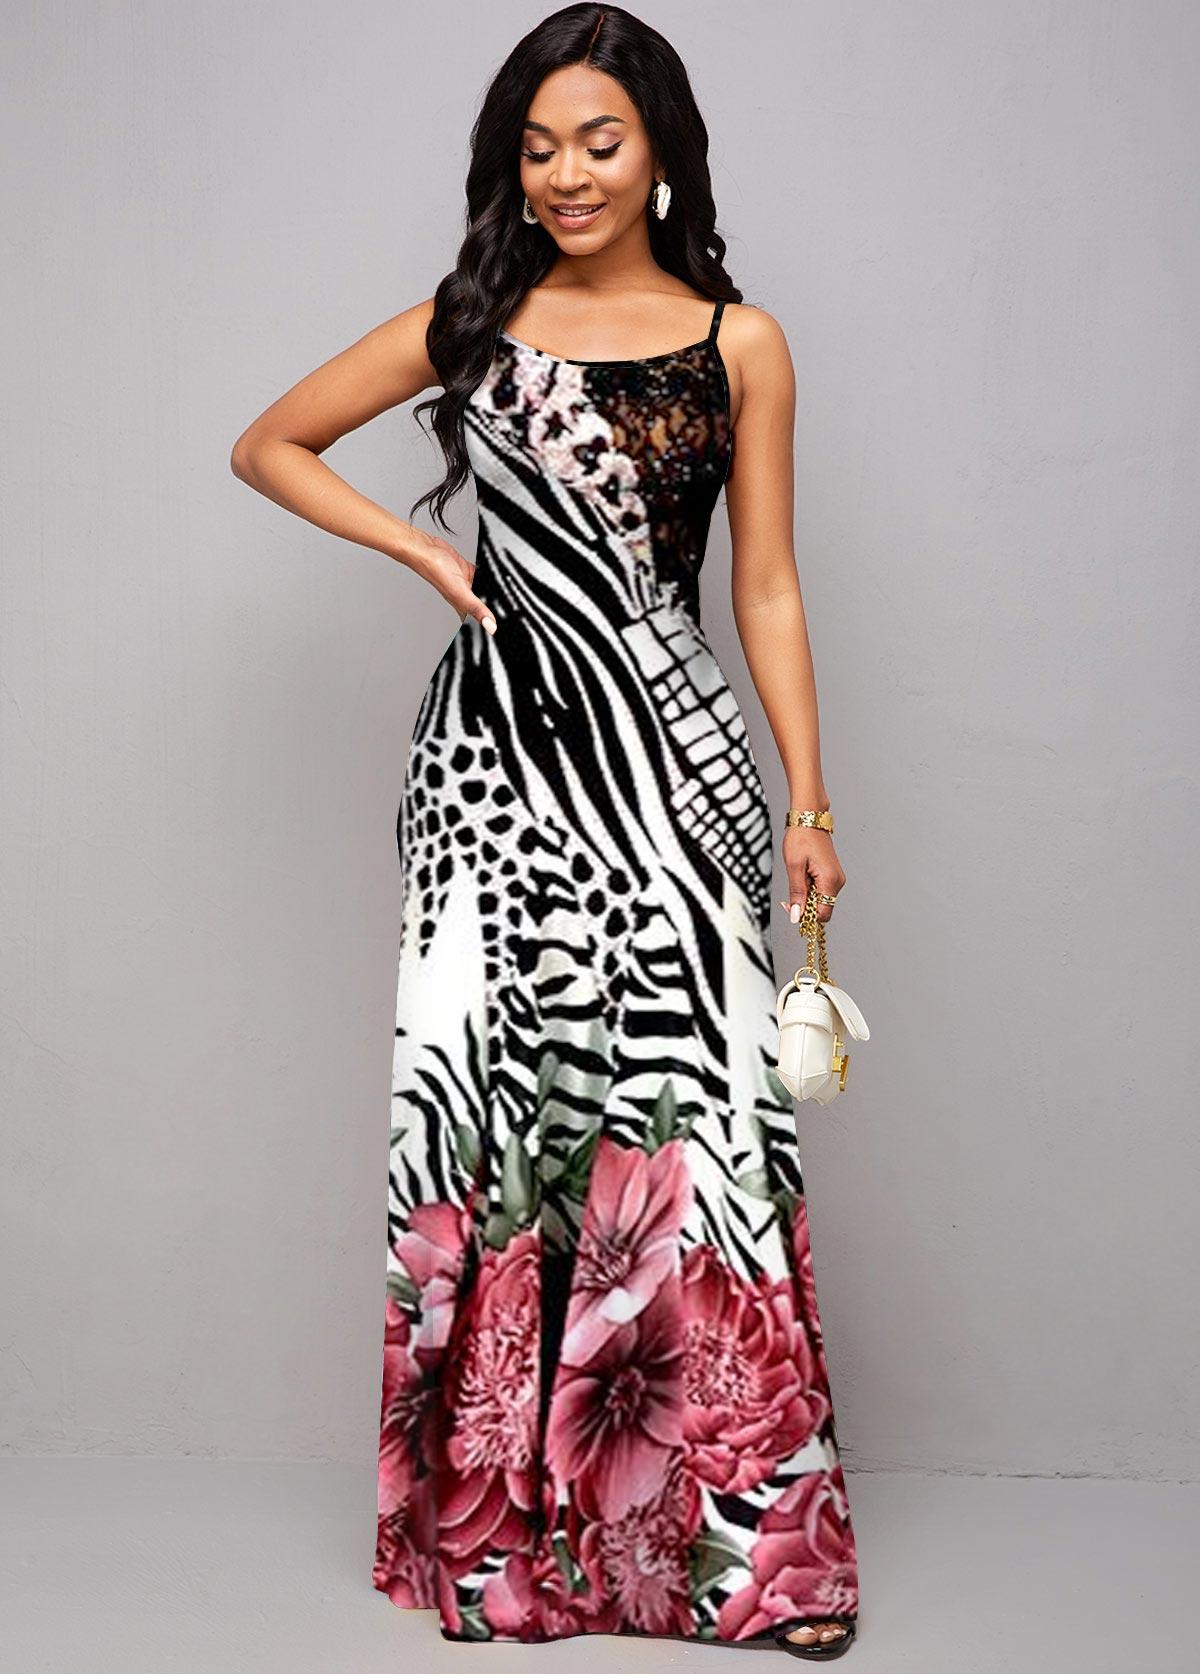 ROTITA Animal and Floral Print Spaghetti Strap Maxi Dress